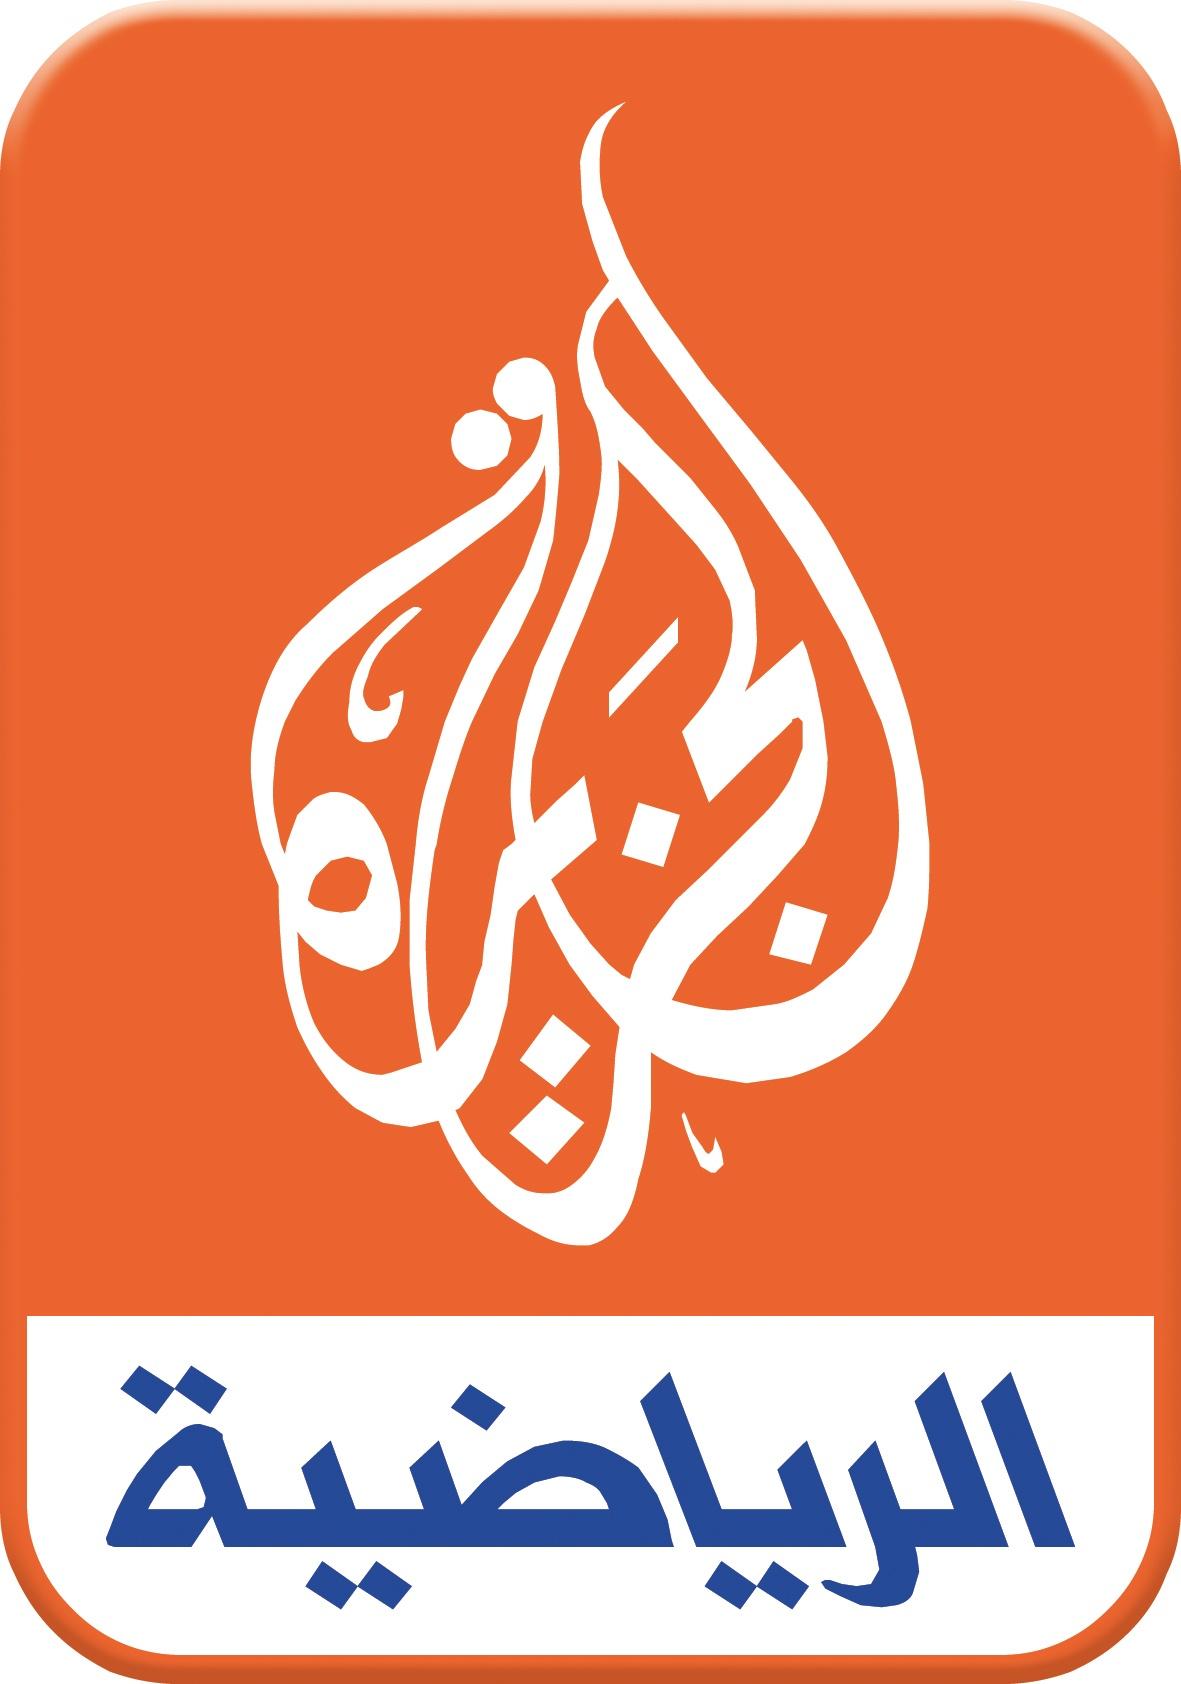 Al jazeera sport